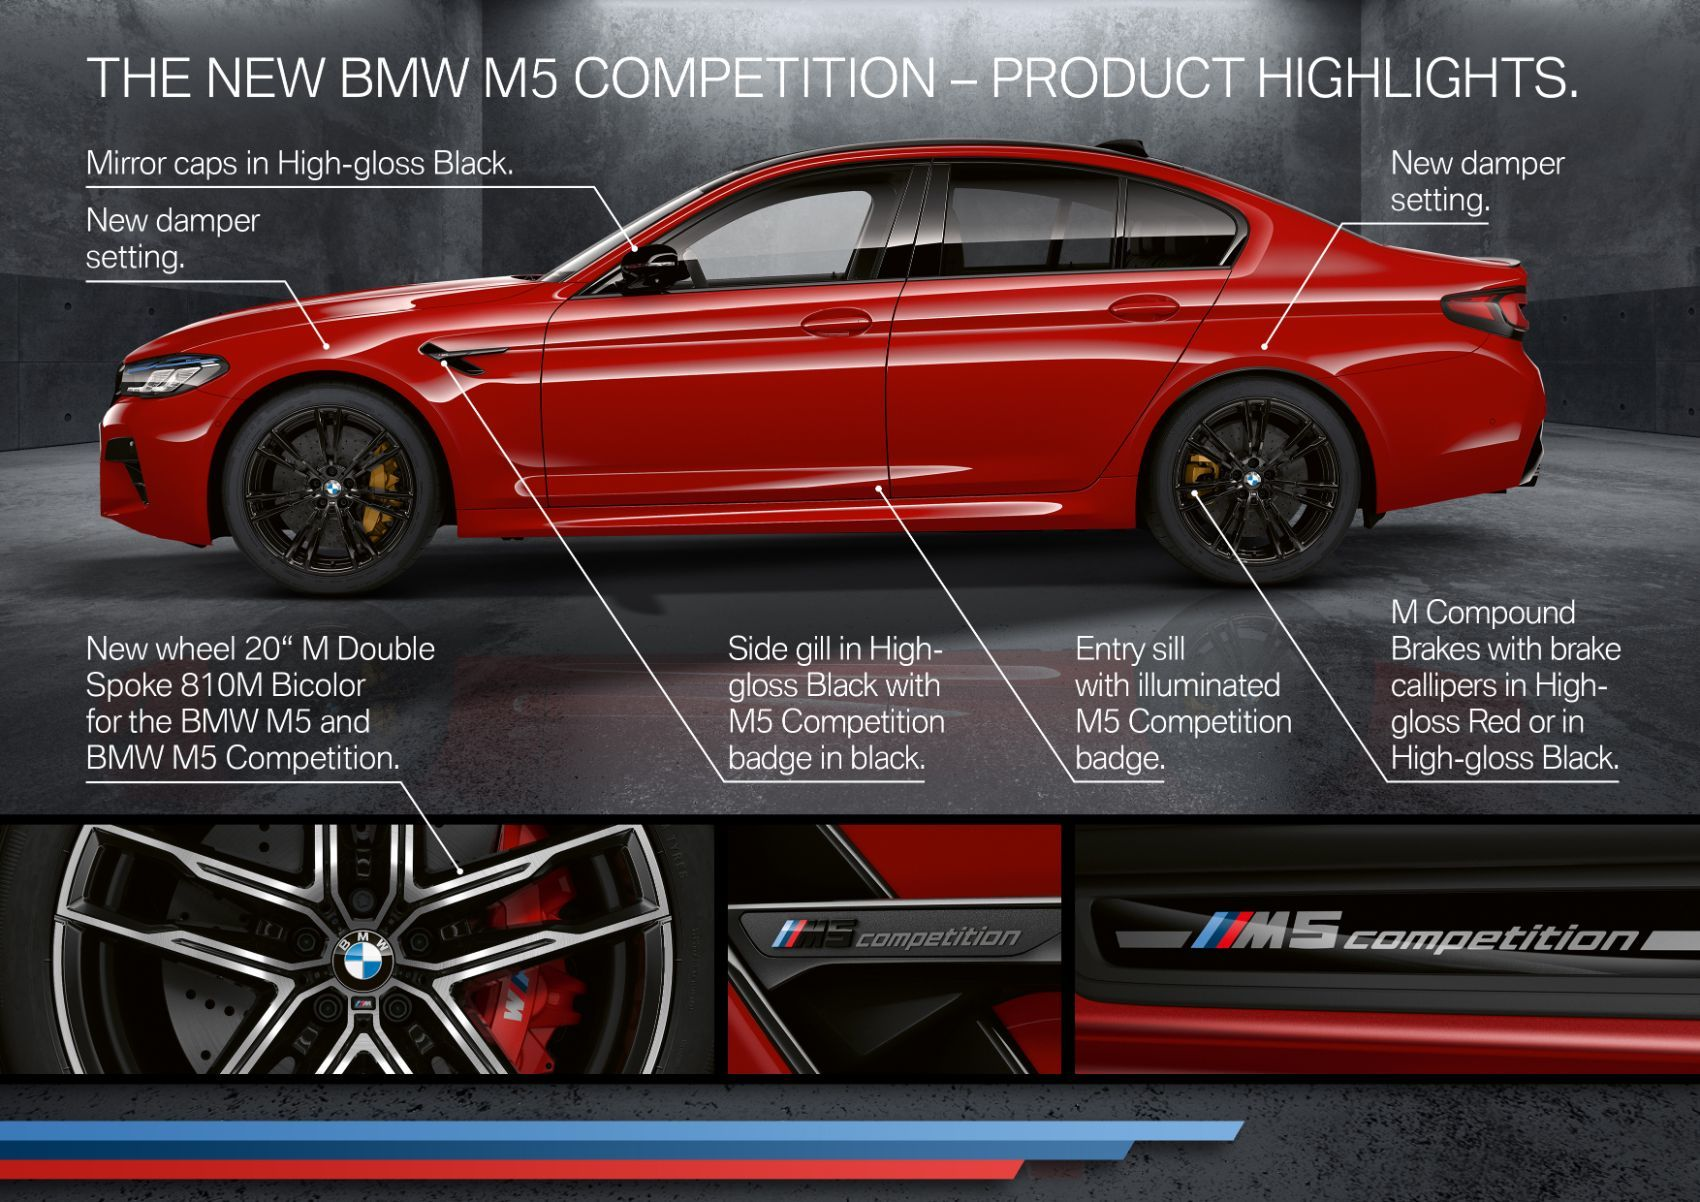 2021 bmw m5 highperformance 5series is better than ever